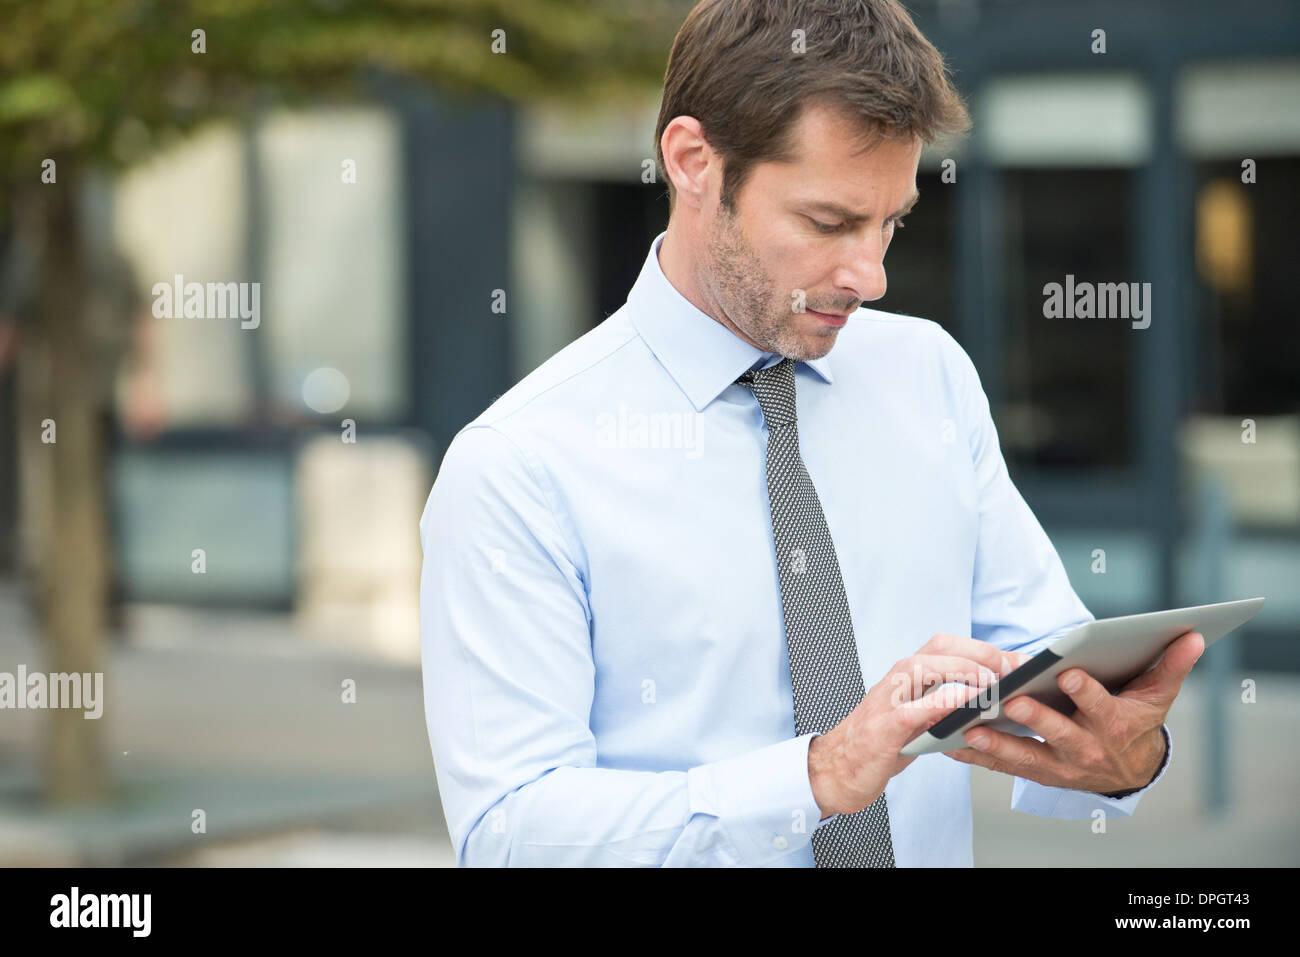 Businessman using digital tablet outdoors Banque D'Images